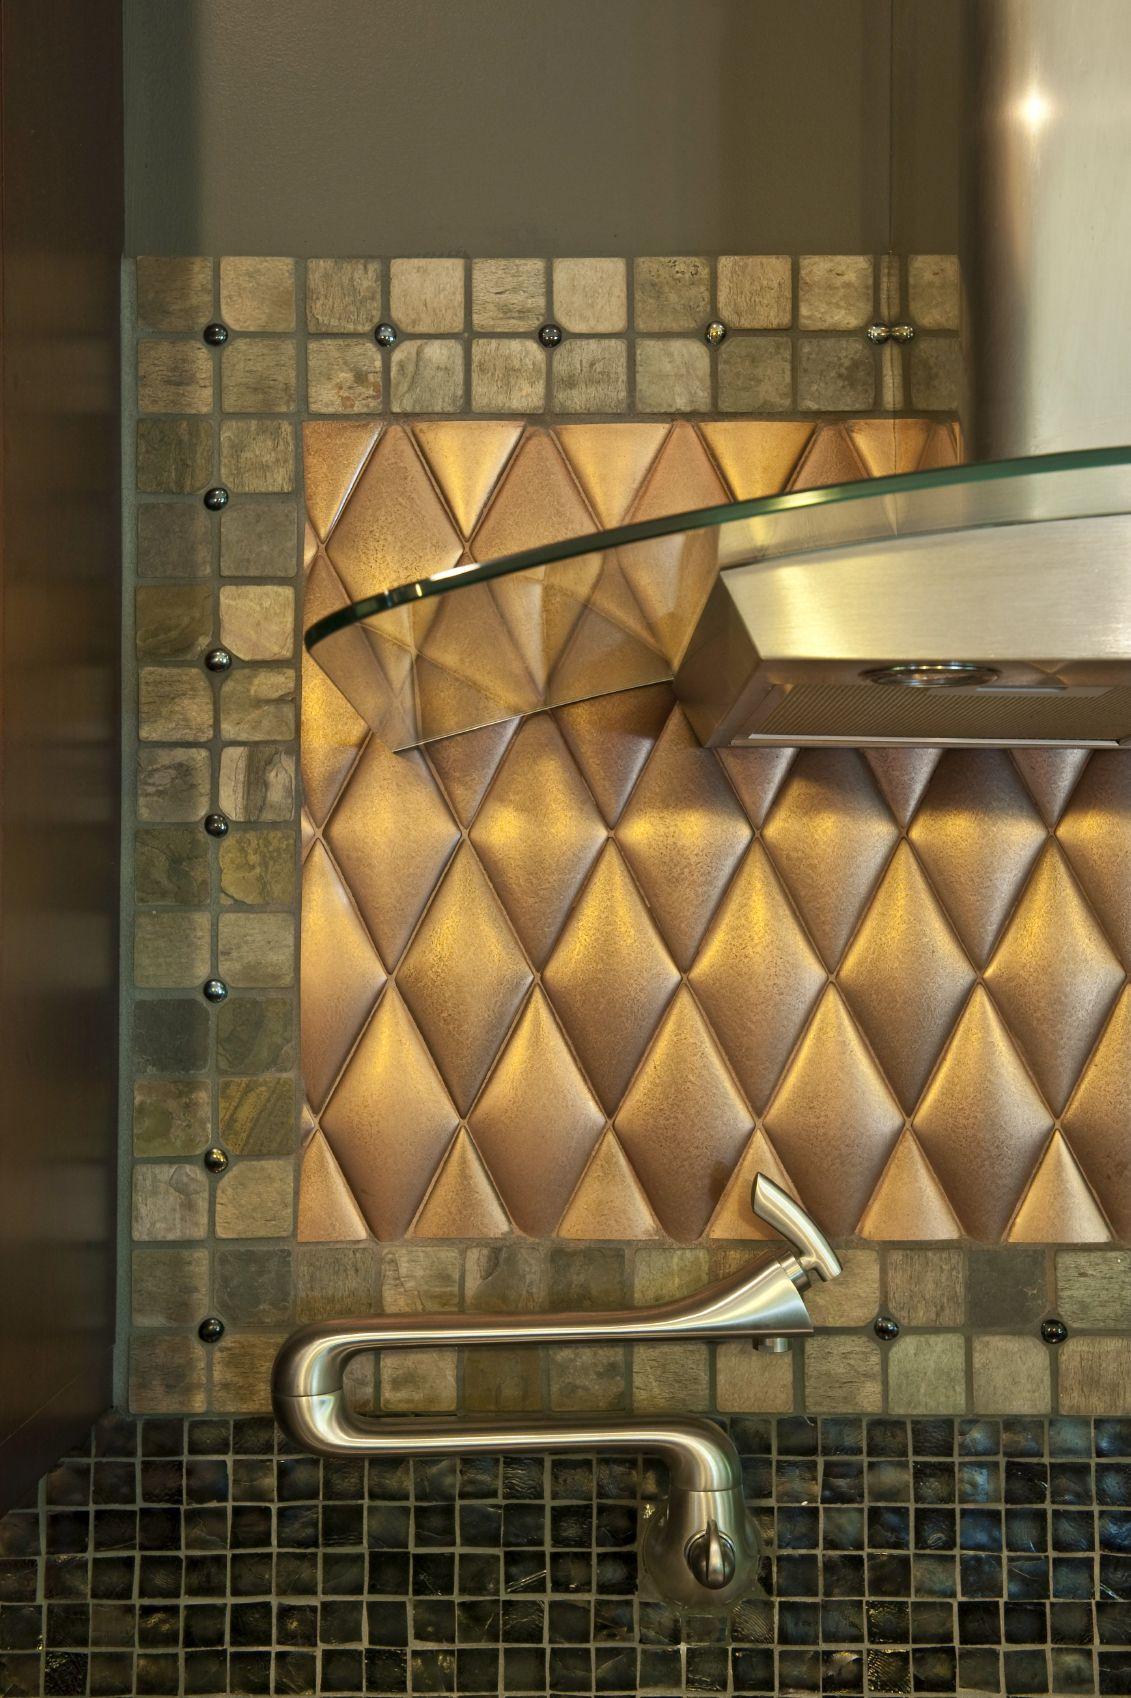 75 kitchen backsplash ideas for 2018 tile glass metal etc rh pinterest co uk